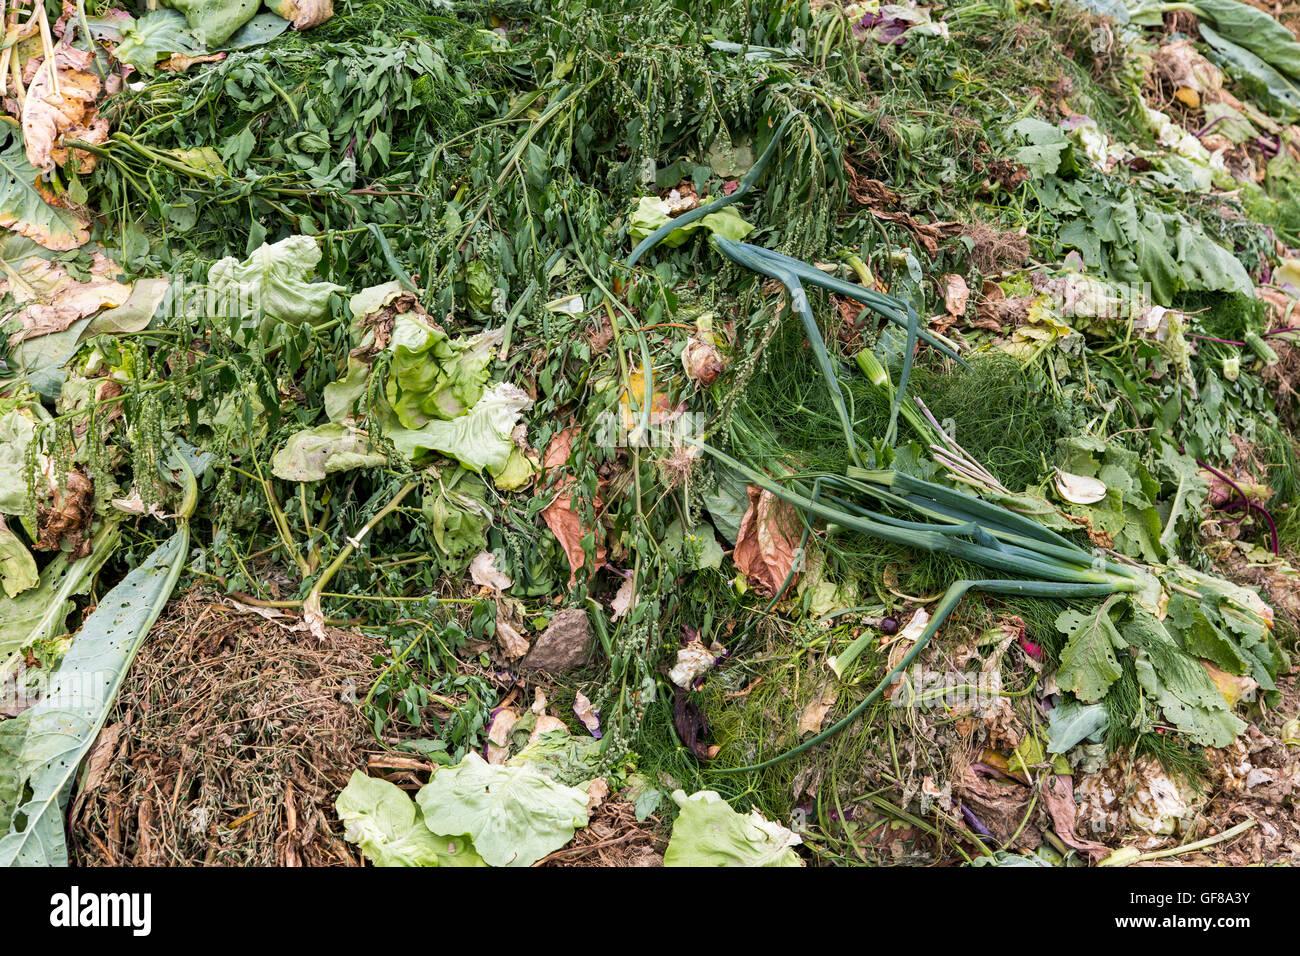 Garten, Gartenbau, Gemüsebau, Komposthaufen, recycling, Stockbild